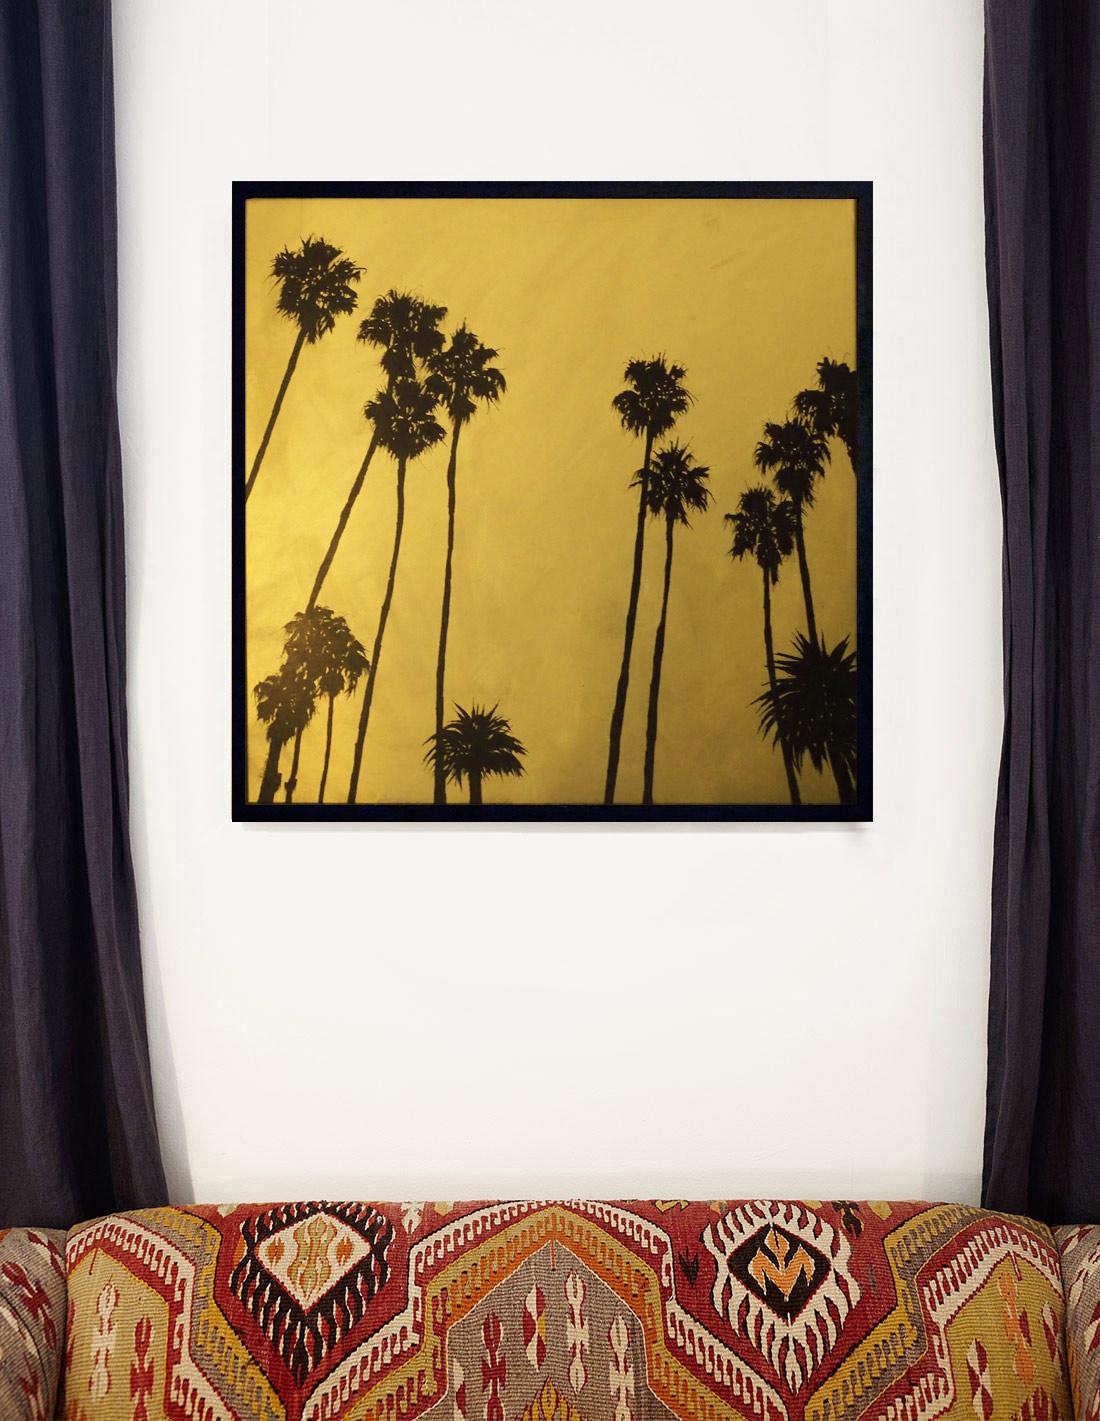 Hubert Jouzeau - Grands palmtrees